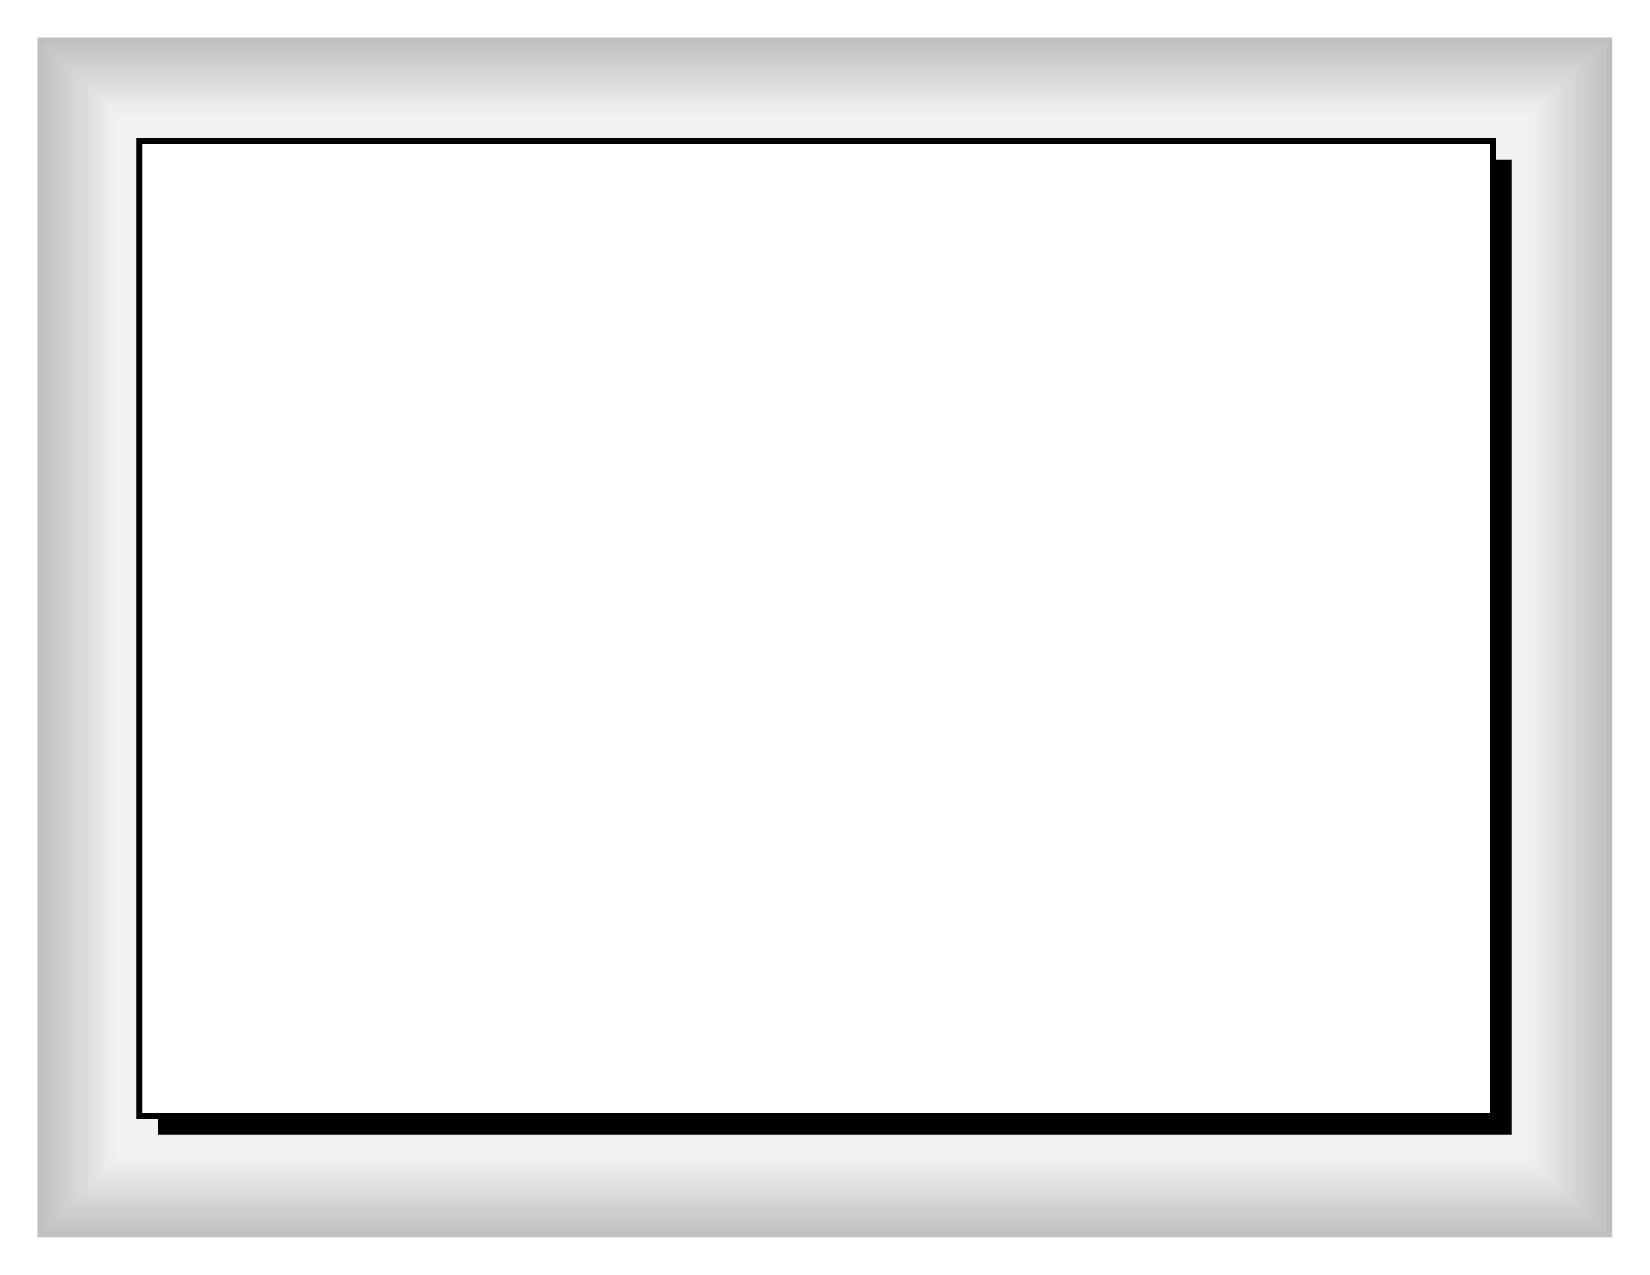 Square Black Frame Png View Full Size ? Square Black Frame Png O ...